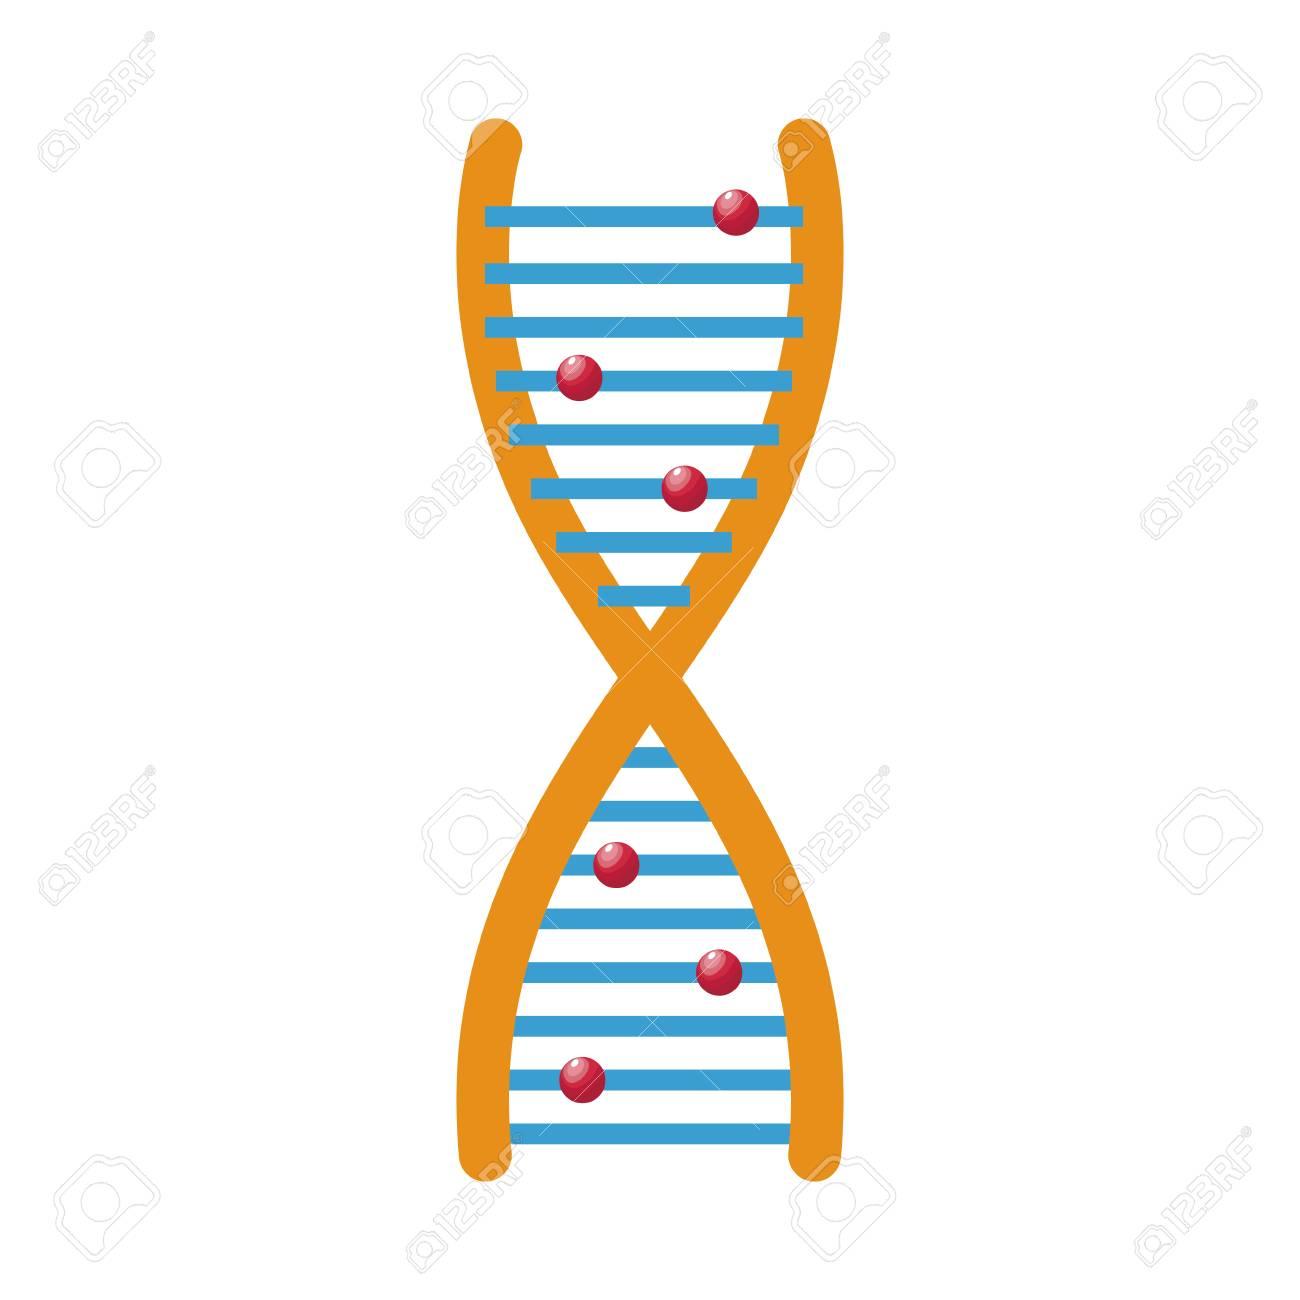 Human Dna And Molecule Symbol For Medicine Genetics Chemistry